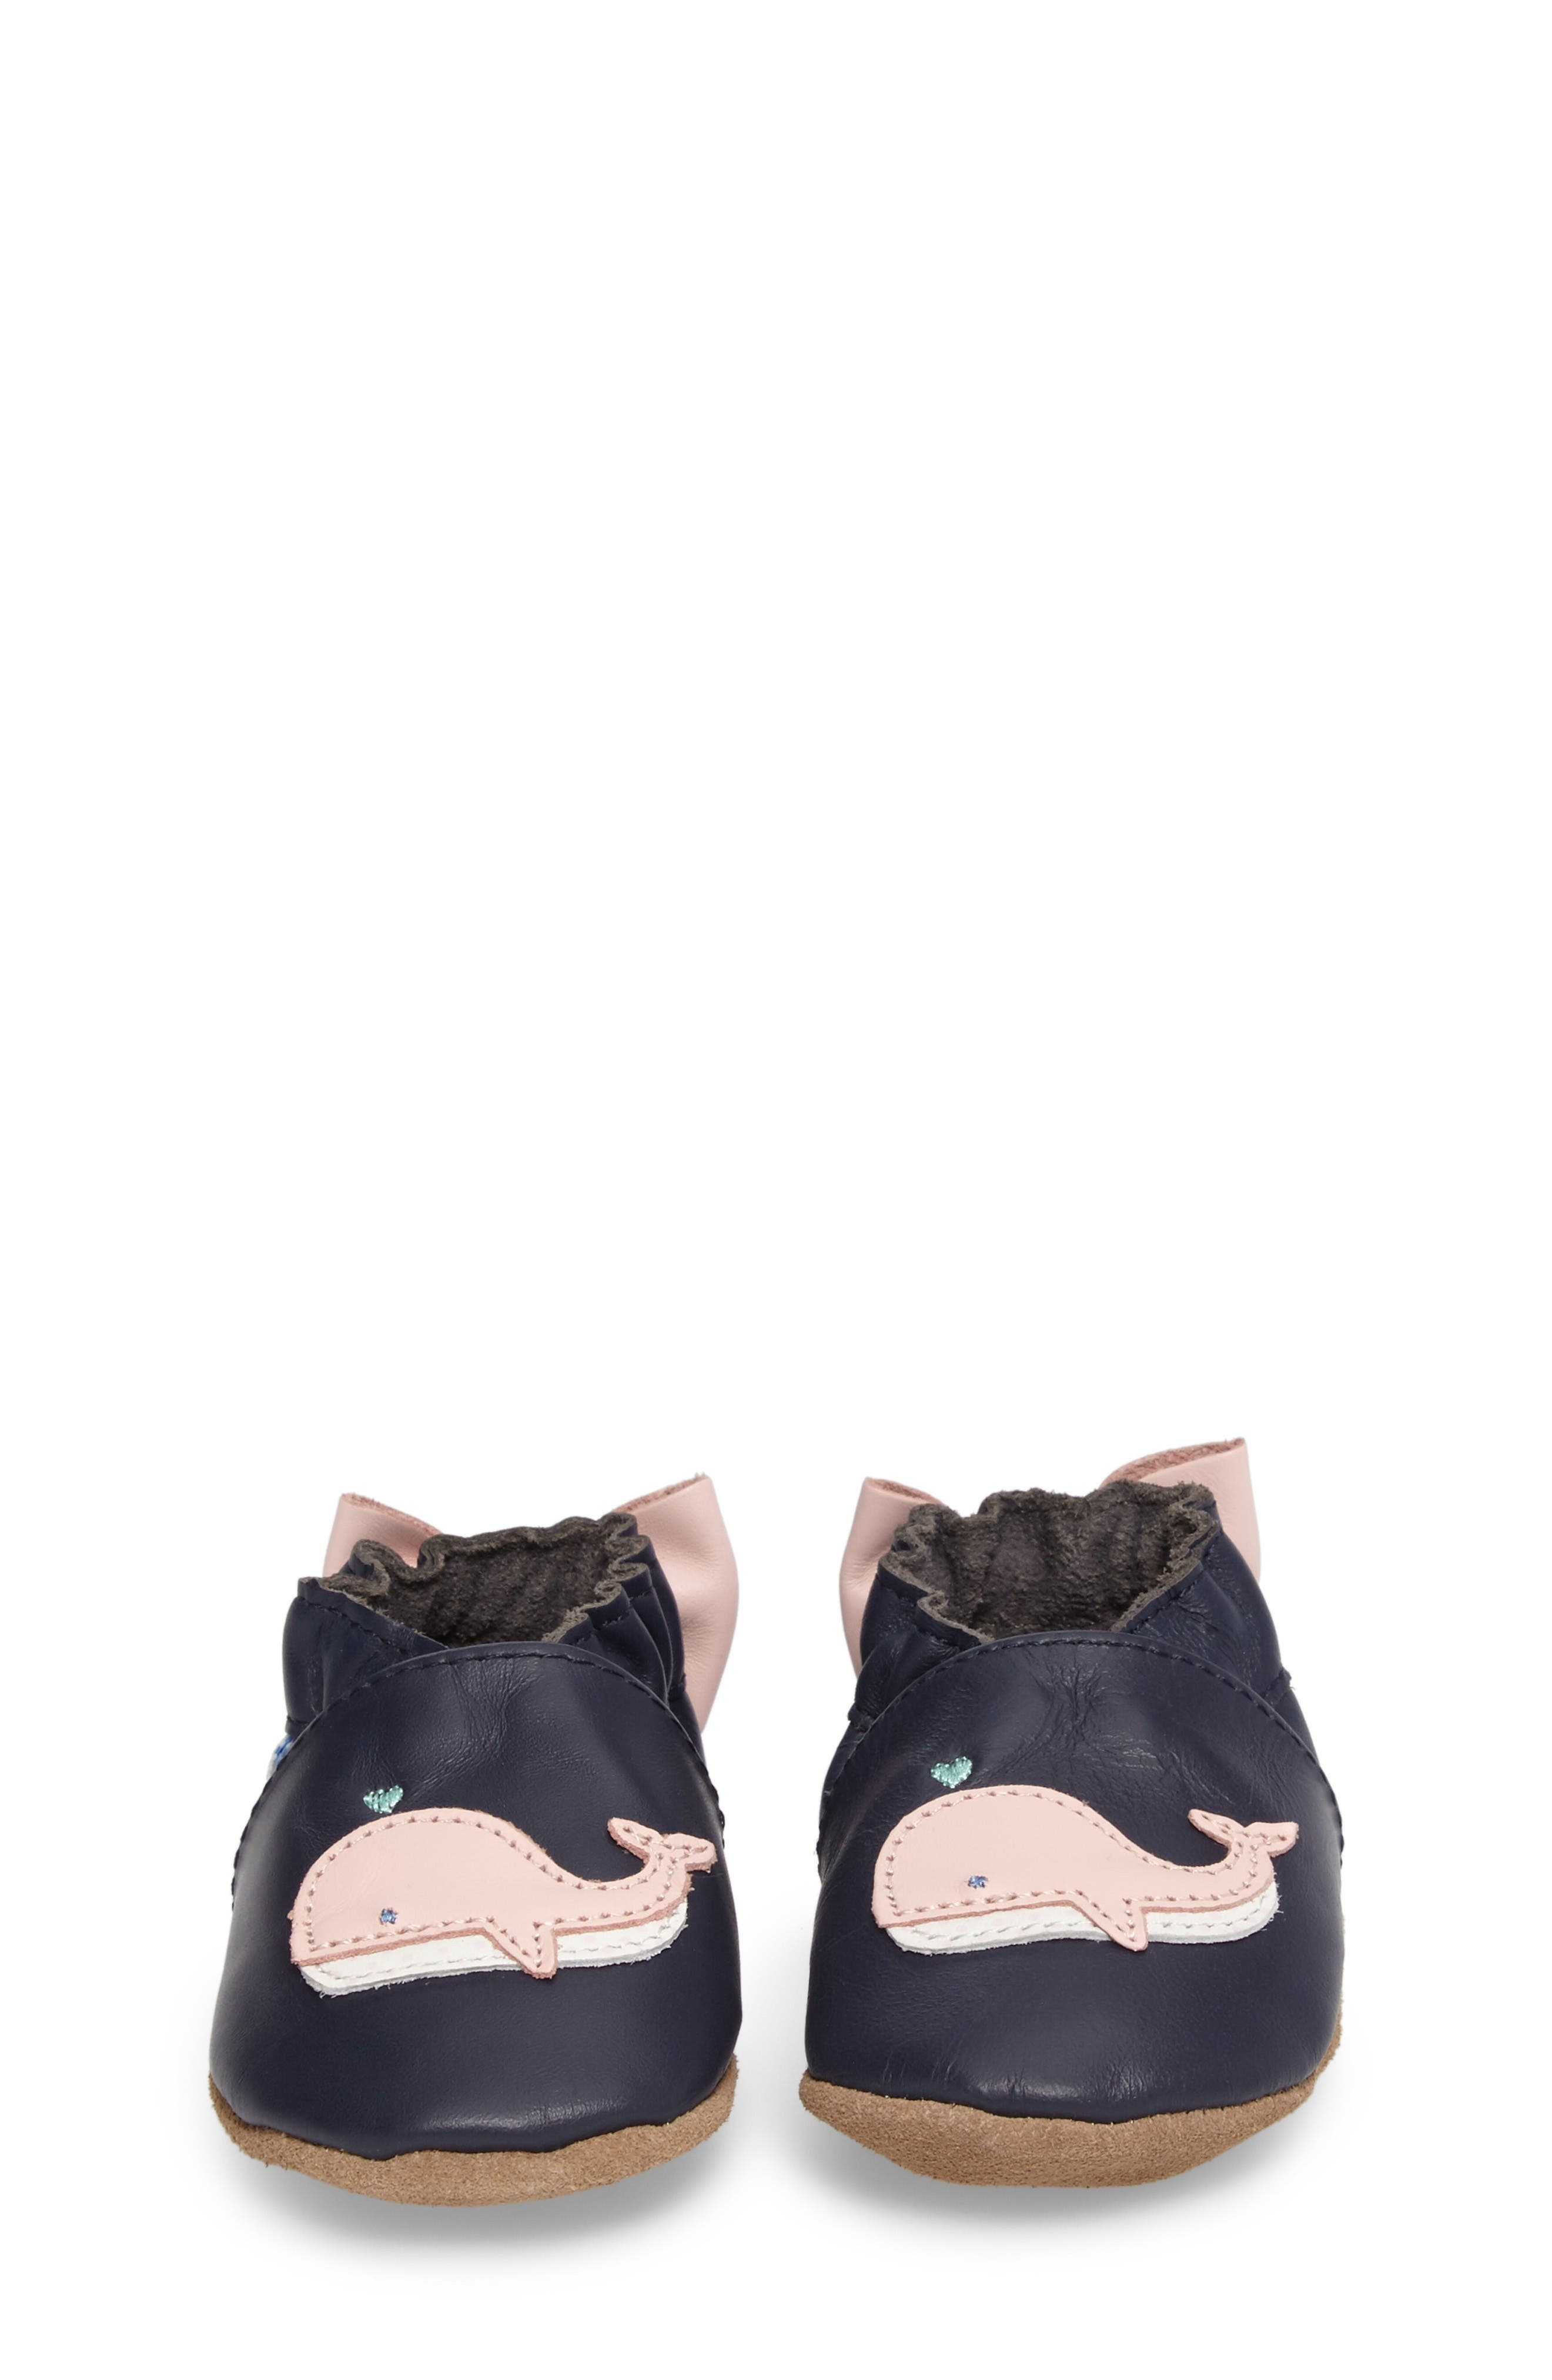 Winnie the Whale Crib Shoe,                             Alternate thumbnail 4, color,                             Navy